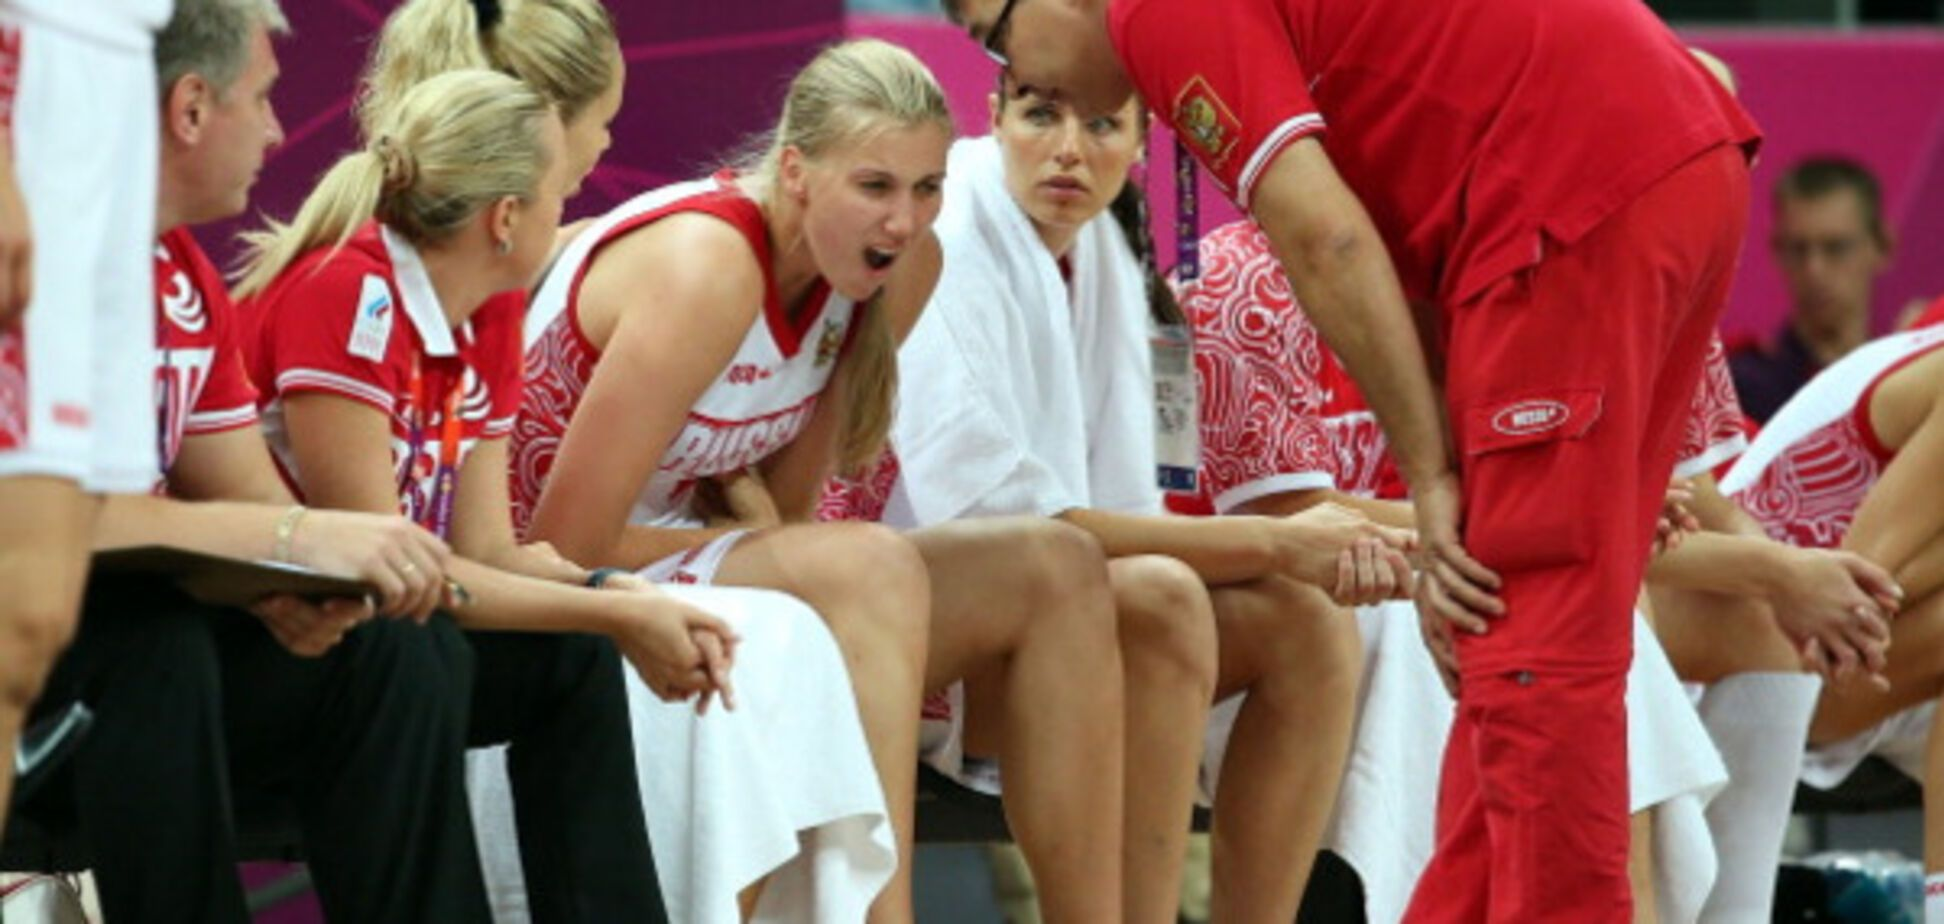 збірна Росії з баскетболу